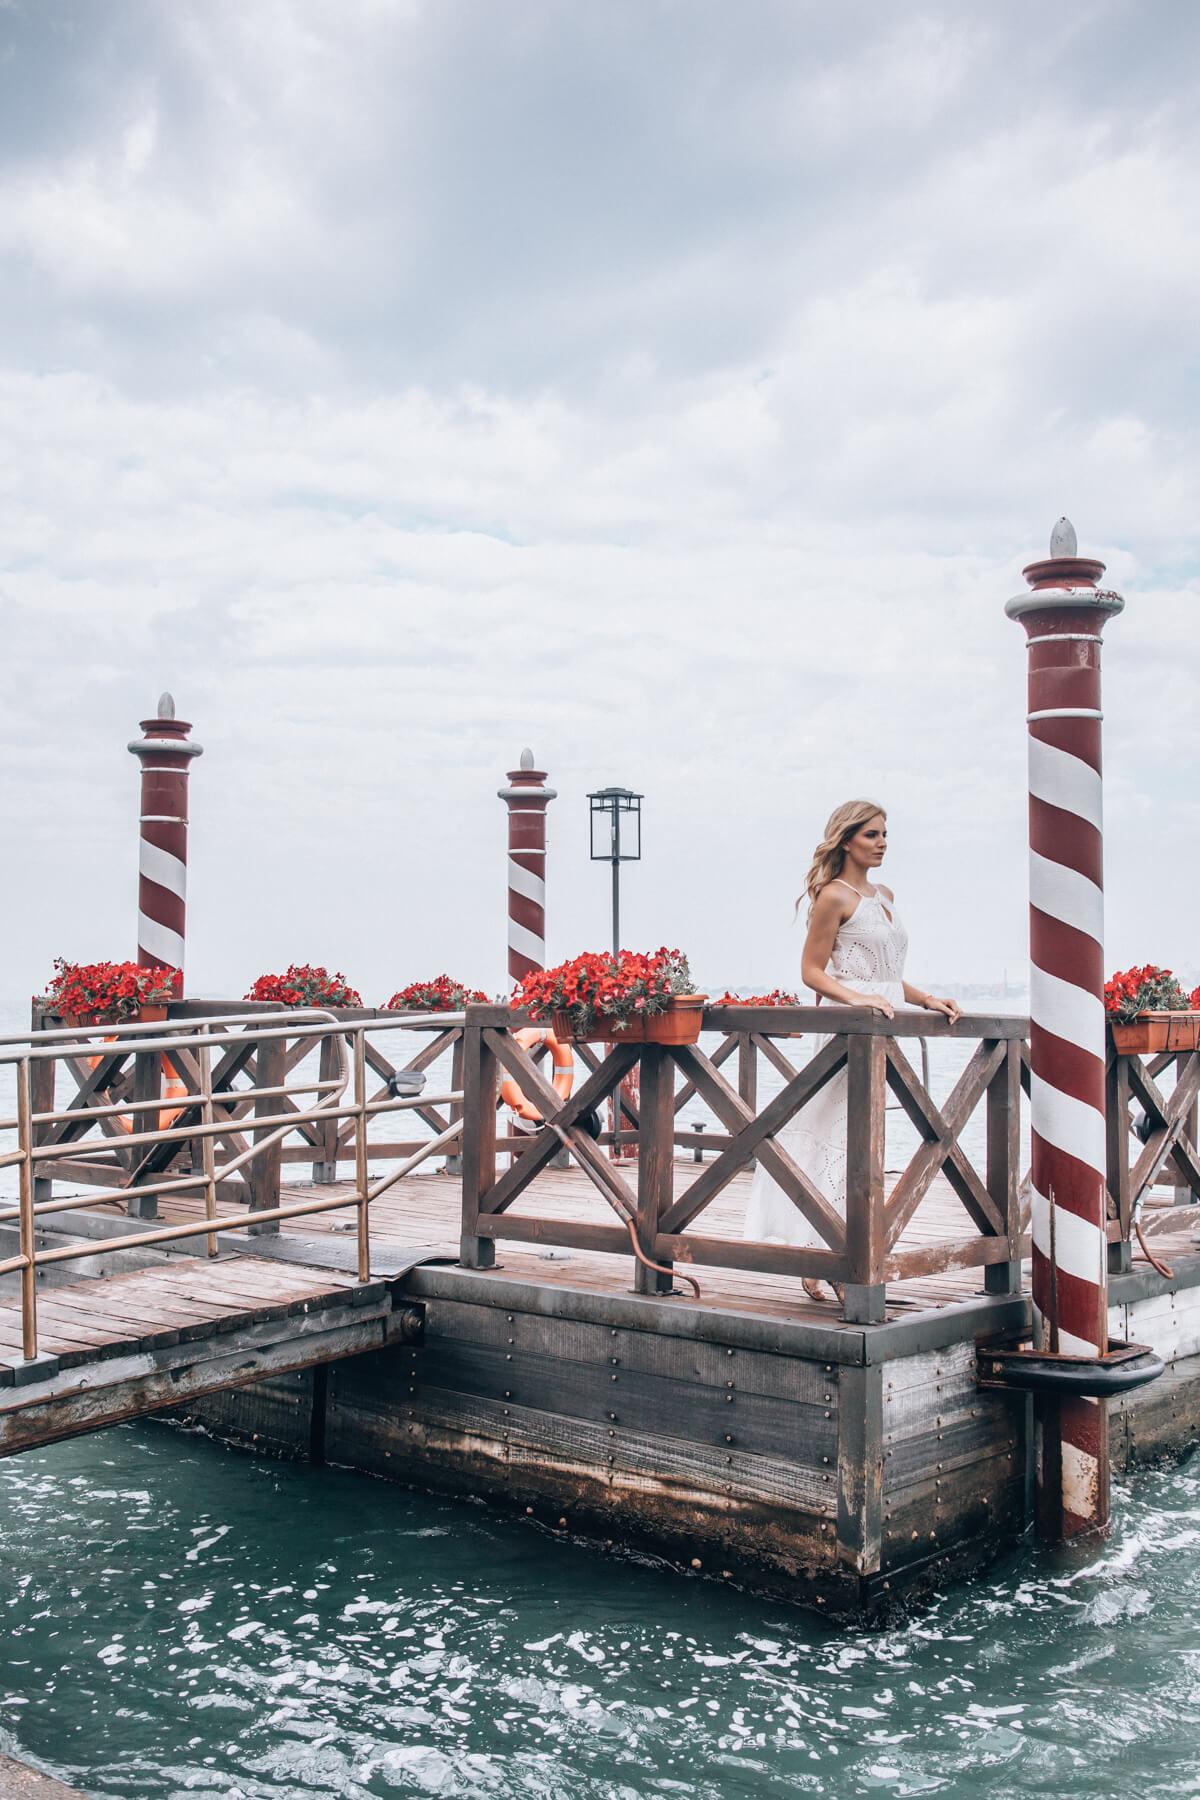 Kempinski Venice